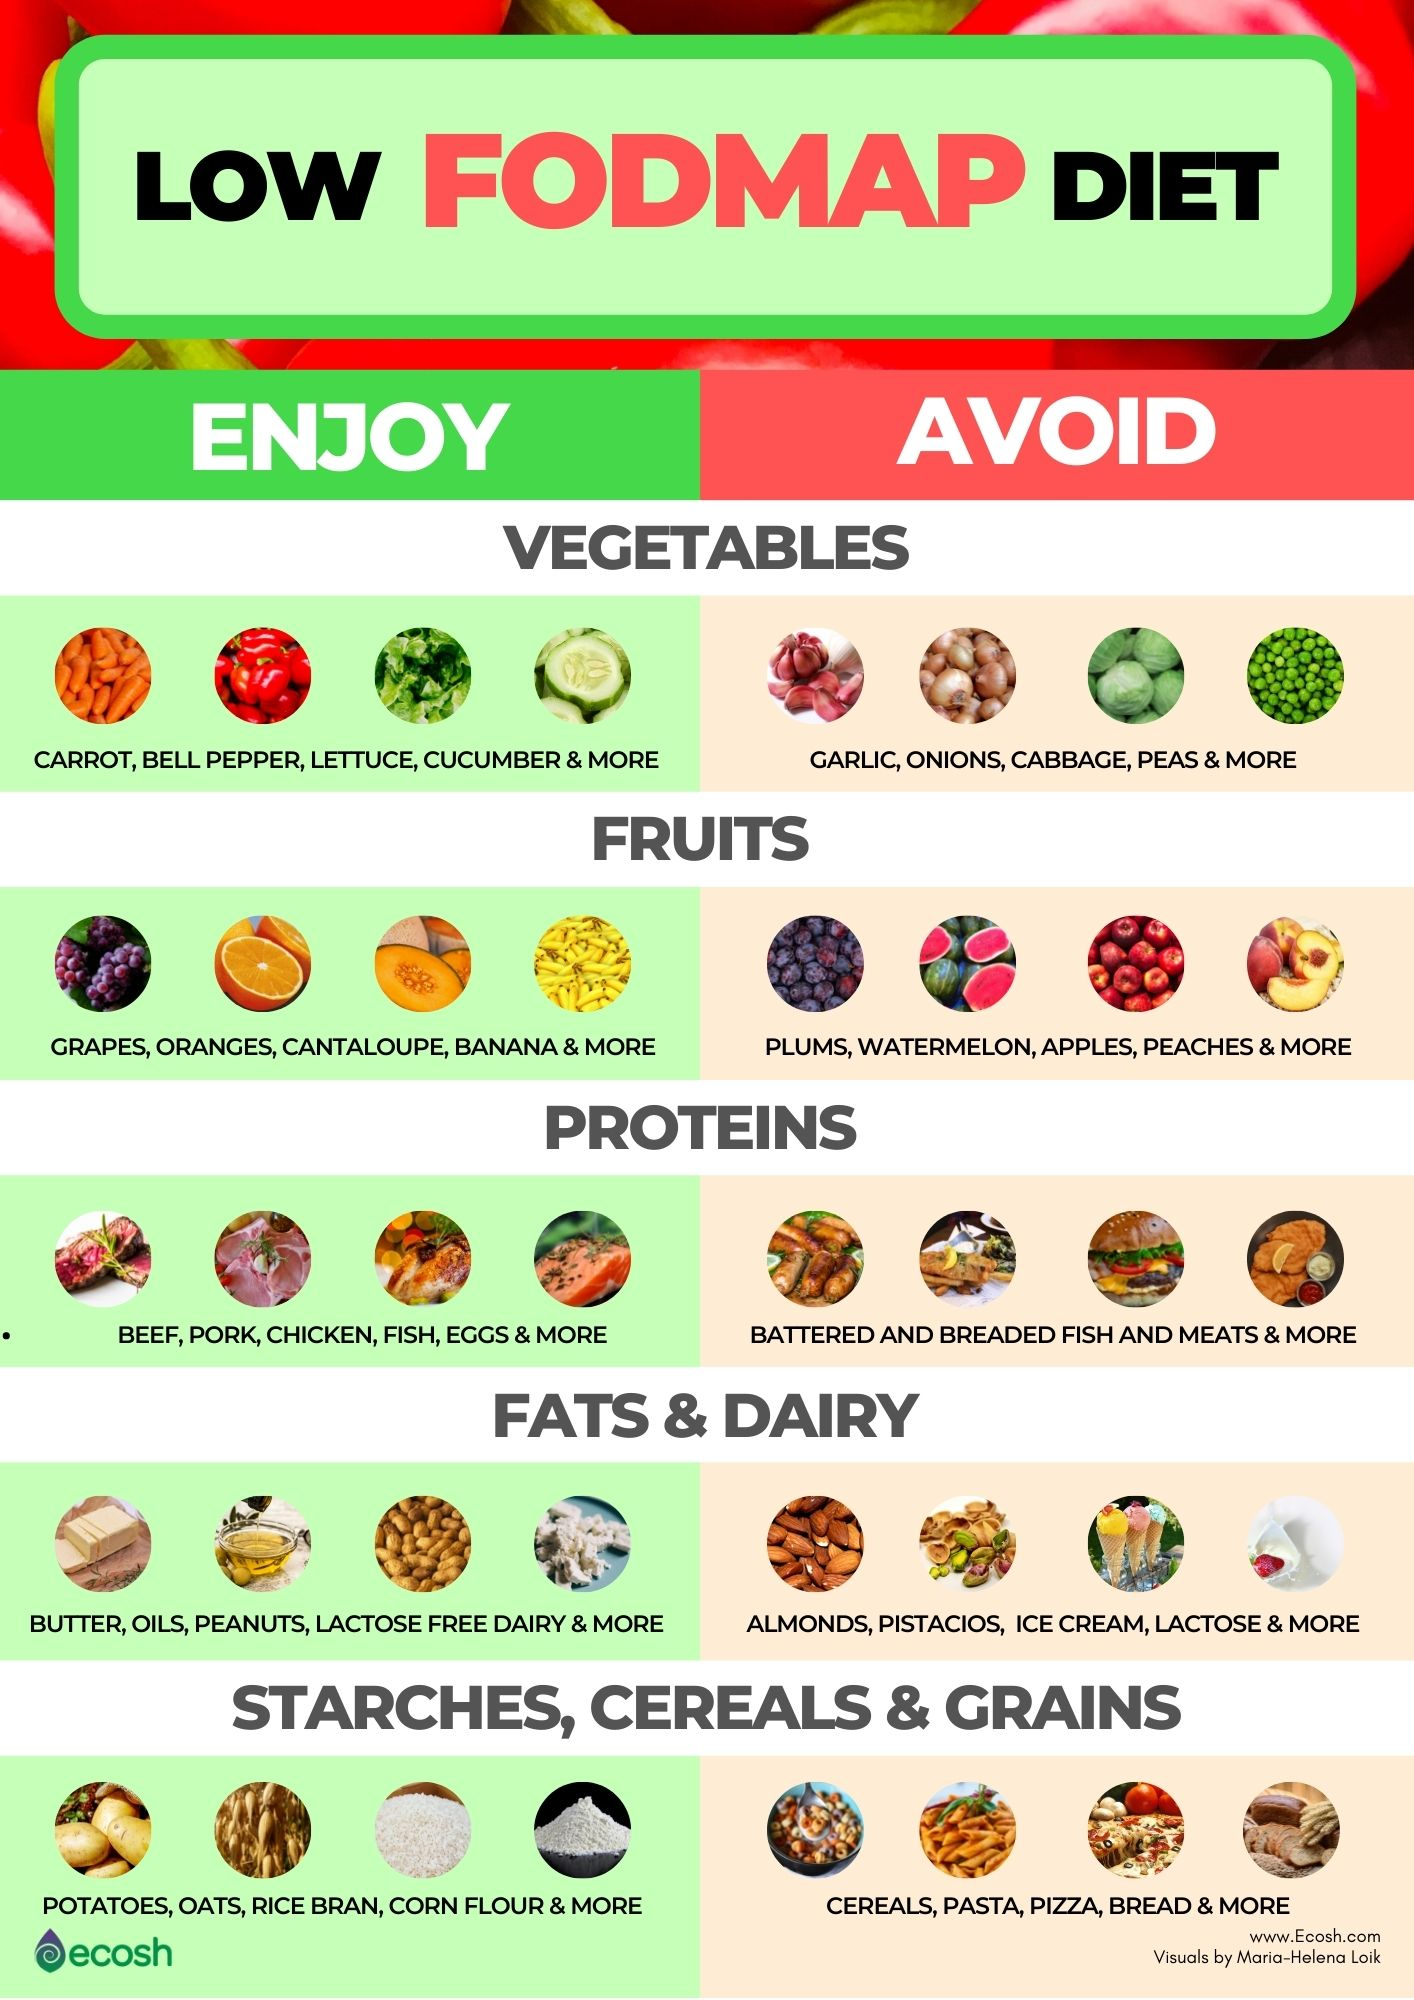 Ecosh_Low_Fodmap_Foods_High_Fodmap_Foods_Low_Fodmap_Diet_Fod_IBS_What_are_Fodmap_Foods_